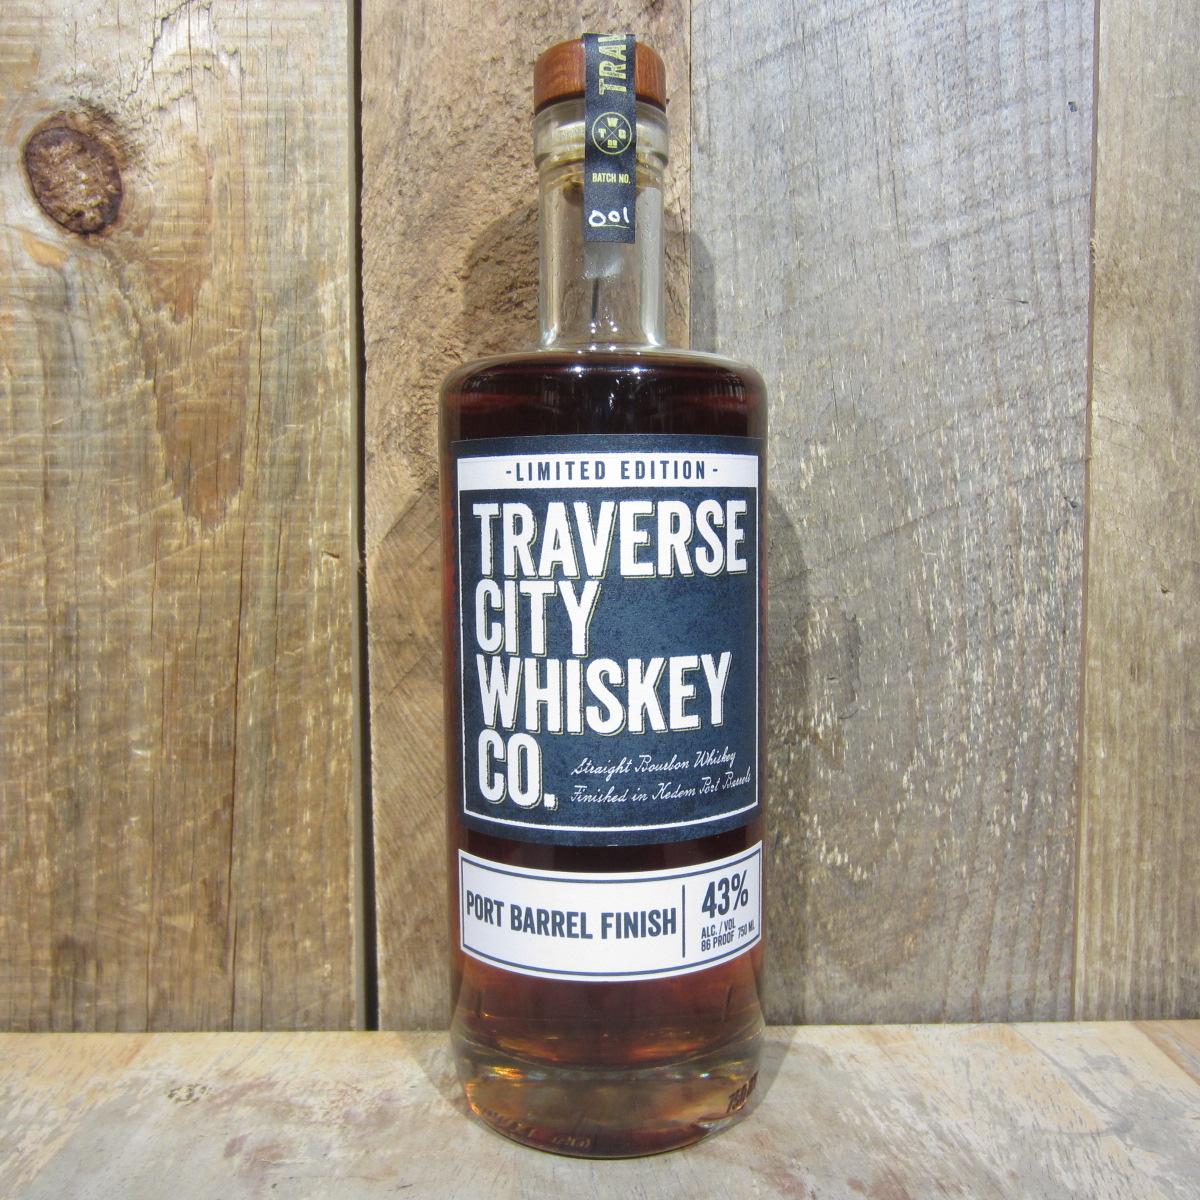 Traverse City Port Barrel Finish Bourbon Whiskey 750ml